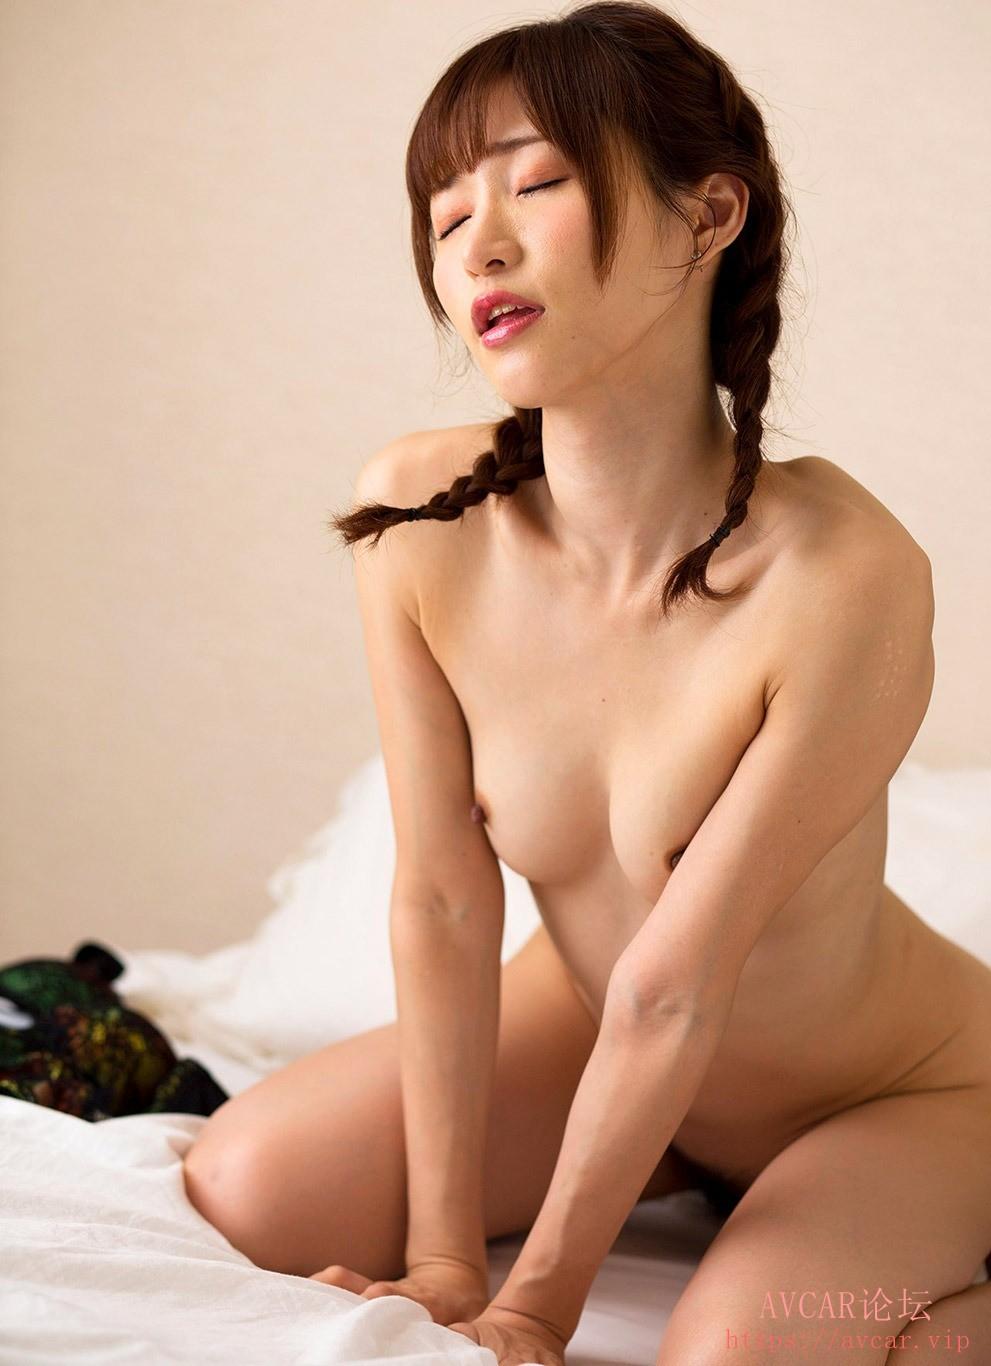 moe-amatsuka-12.jpg